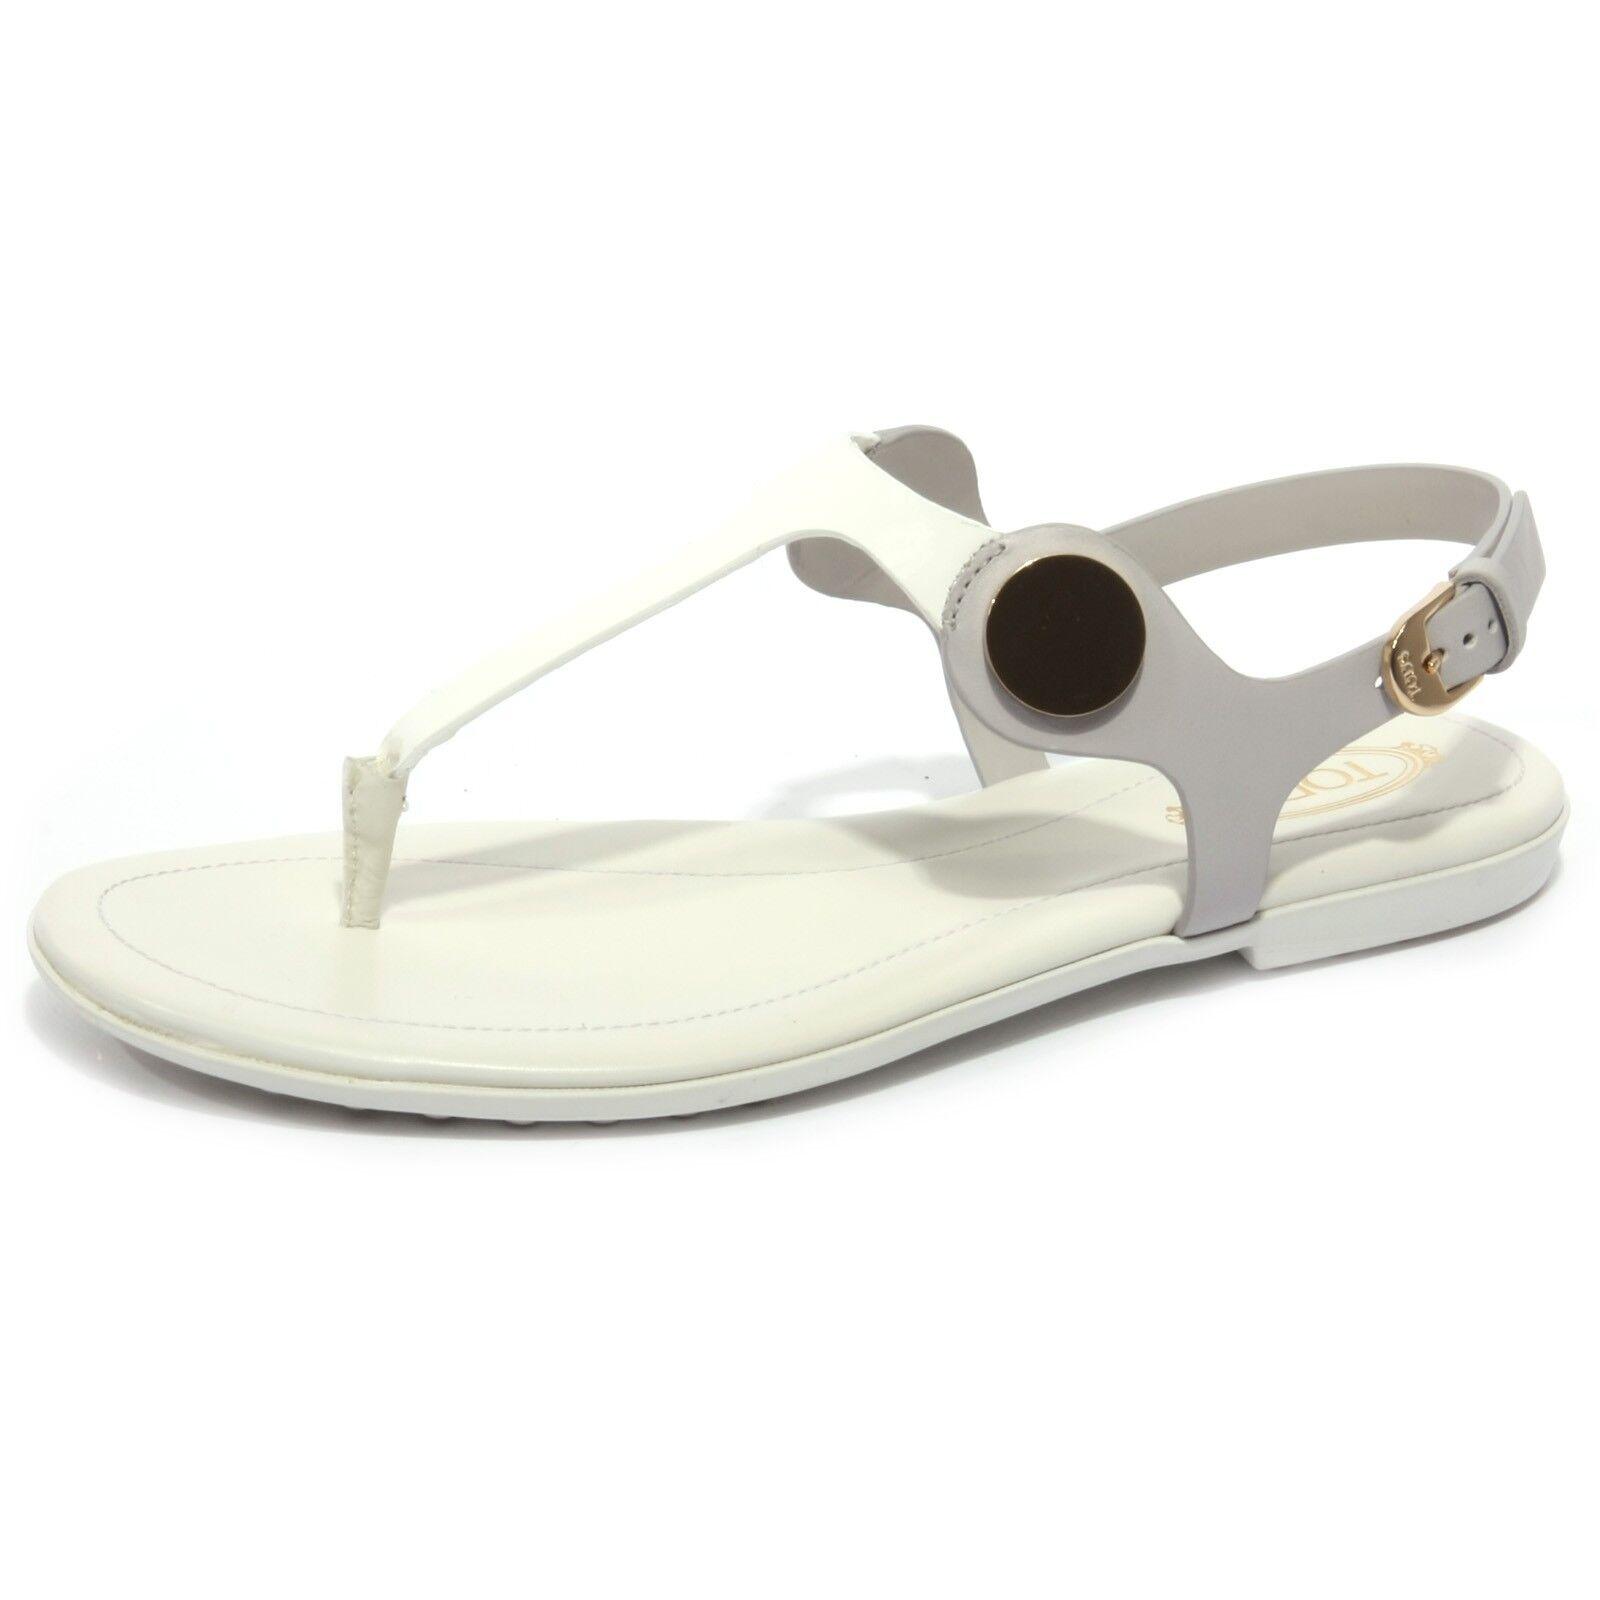 B1680 INFRADITO mujer Tod'S Sandalo gris using Ojotas Zapato Mujer